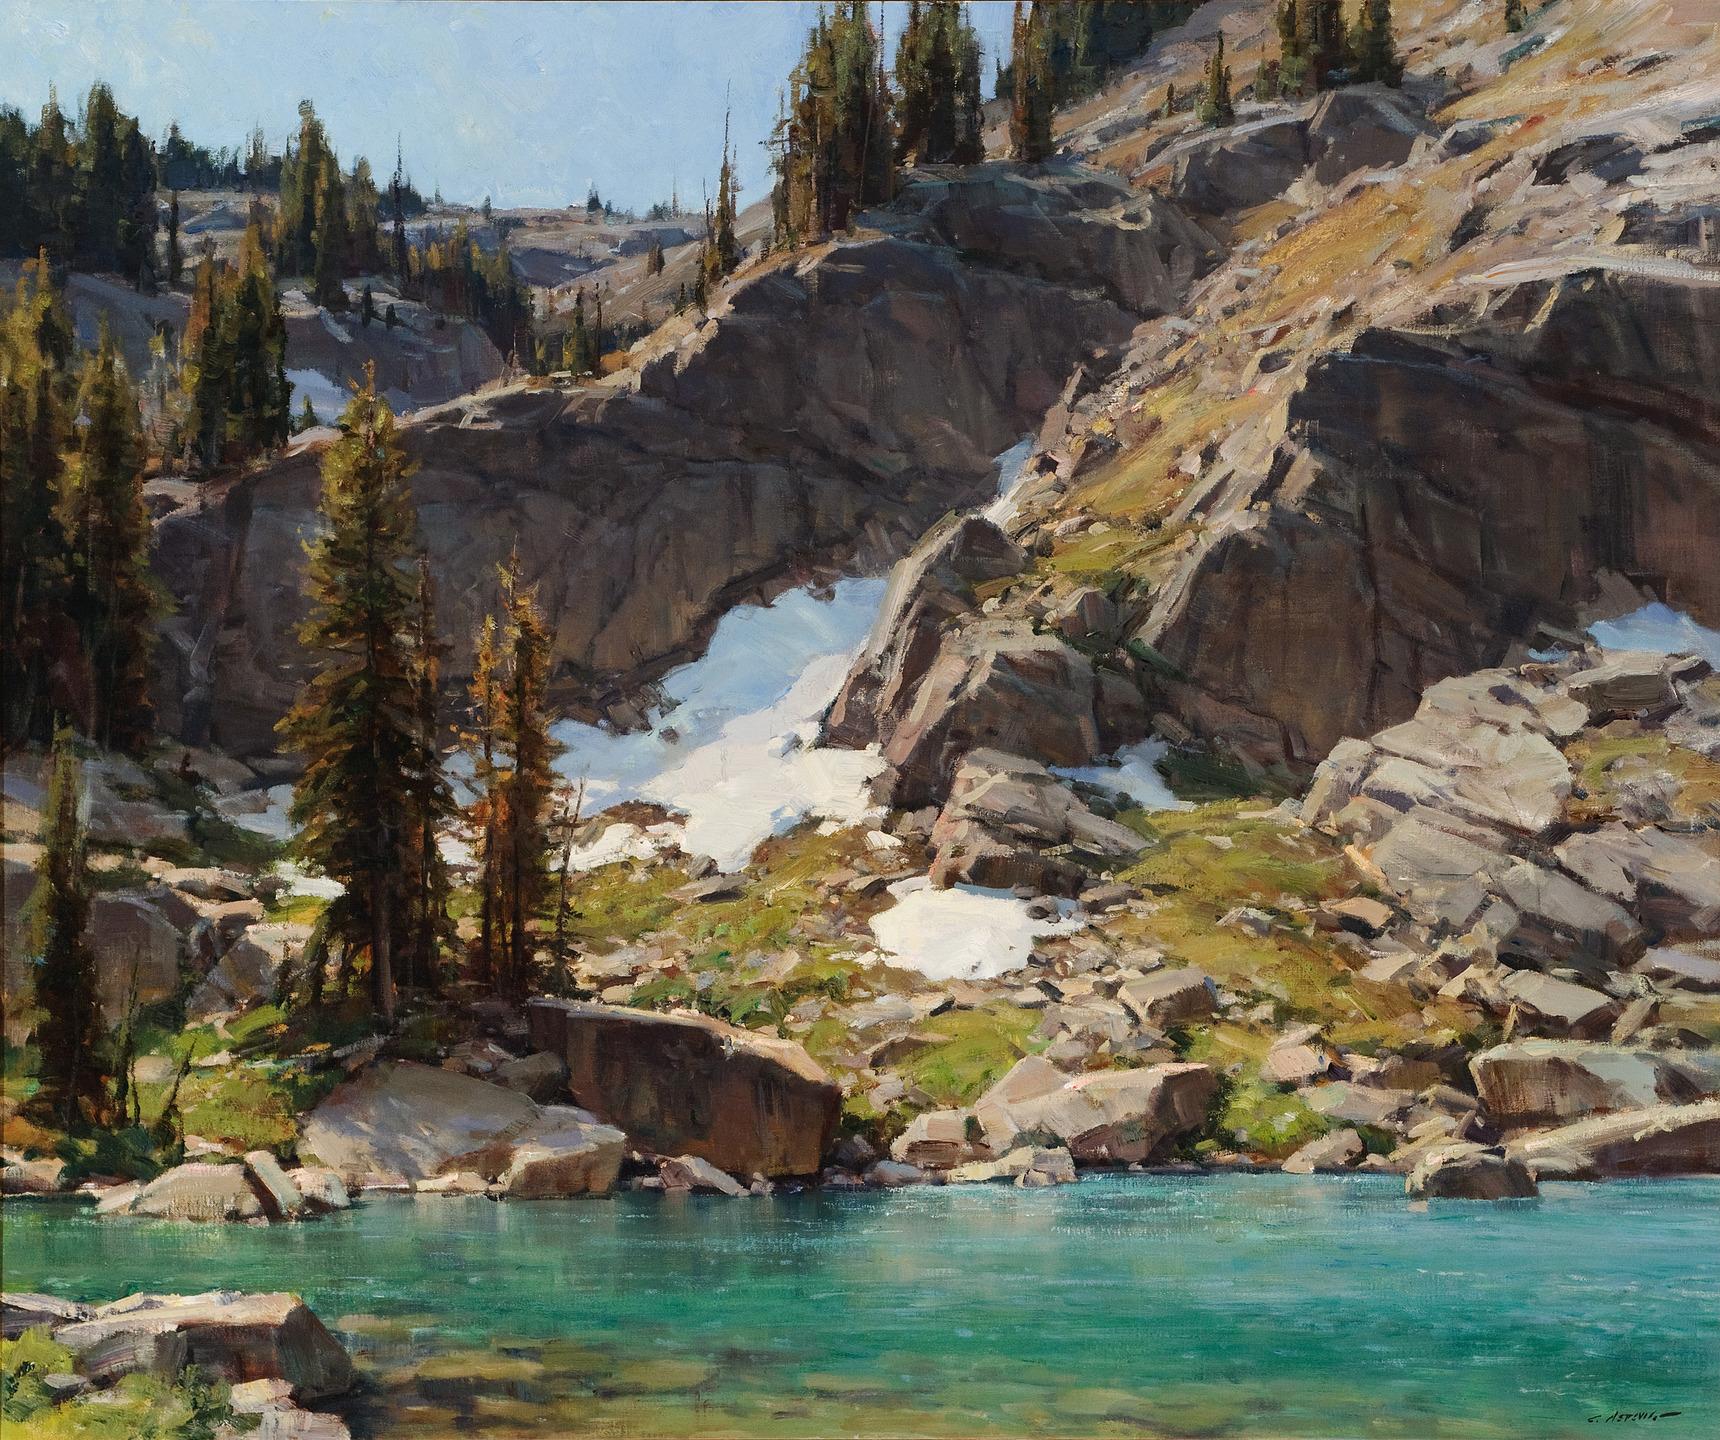 Alpine Lake by Clyde Aspevig